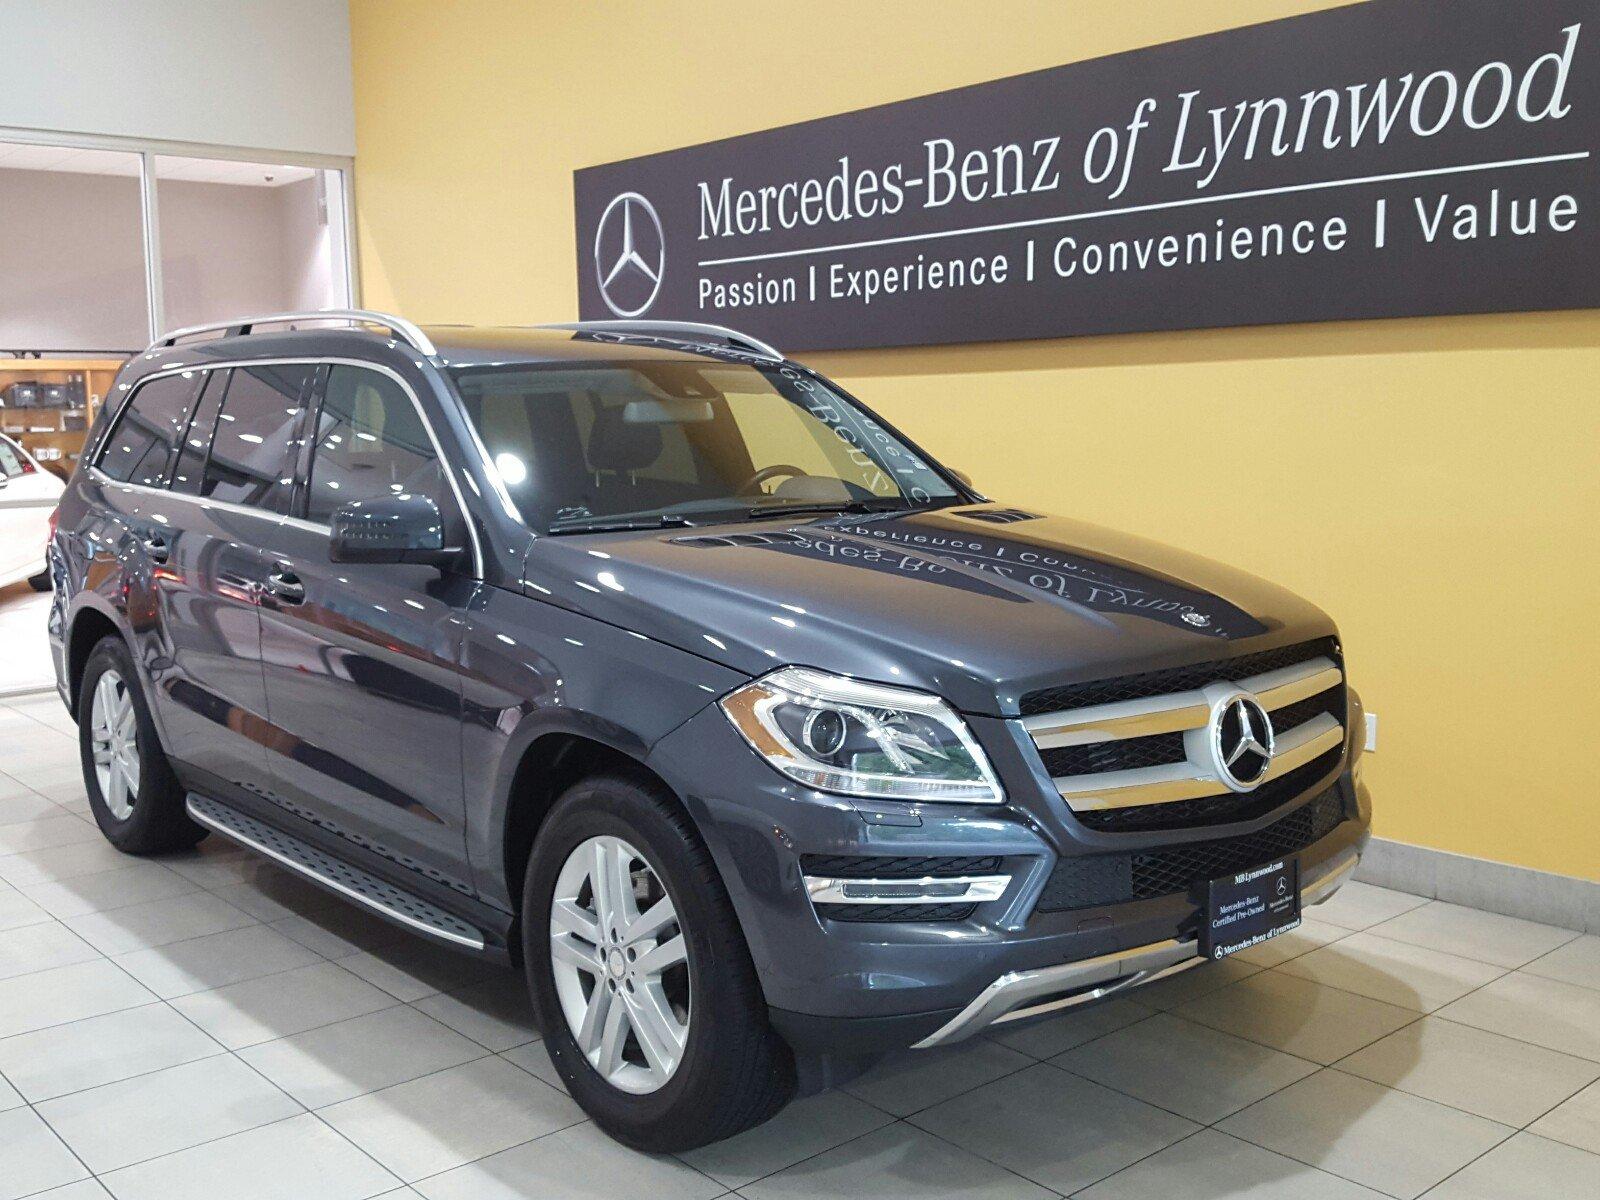 Photo Certified Pre-Owned 2014 Mercedes-Benz GL 350 BlueTEC 4MATIC